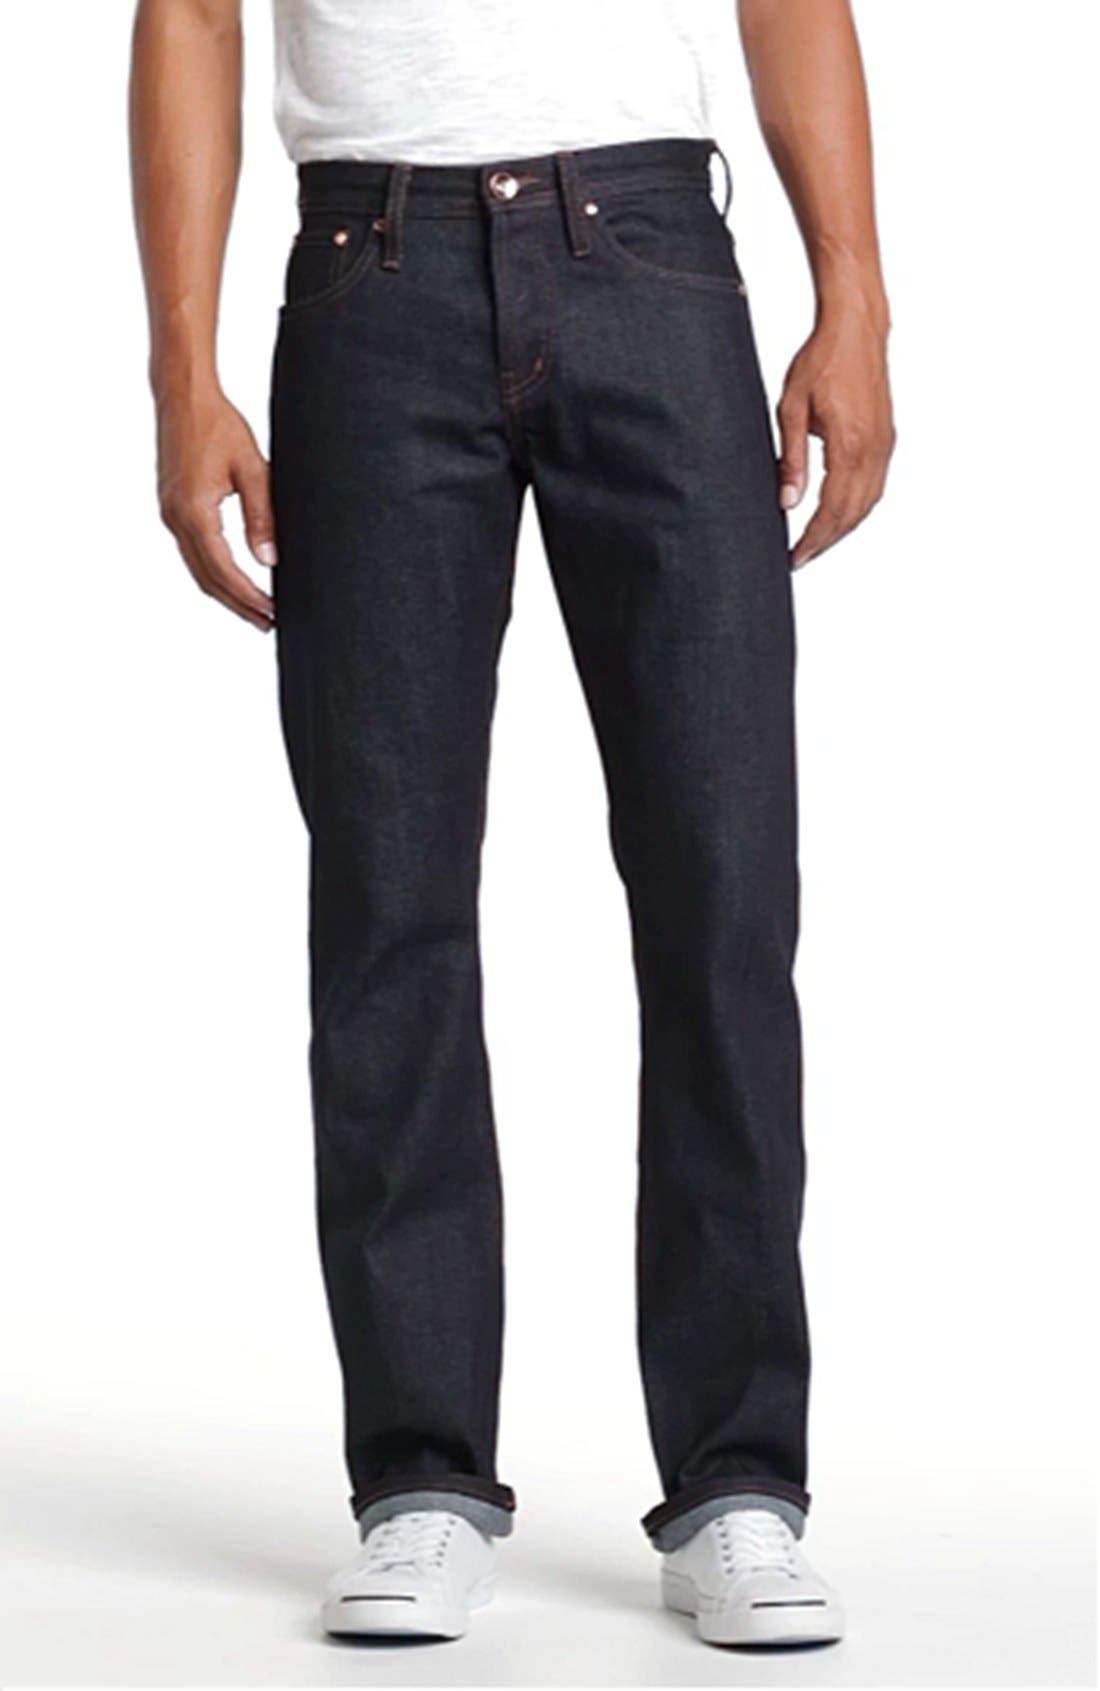 UB301 Straight Leg Raw Selvedge Jeans,                             Alternate thumbnail 8, color,                             INDIGO